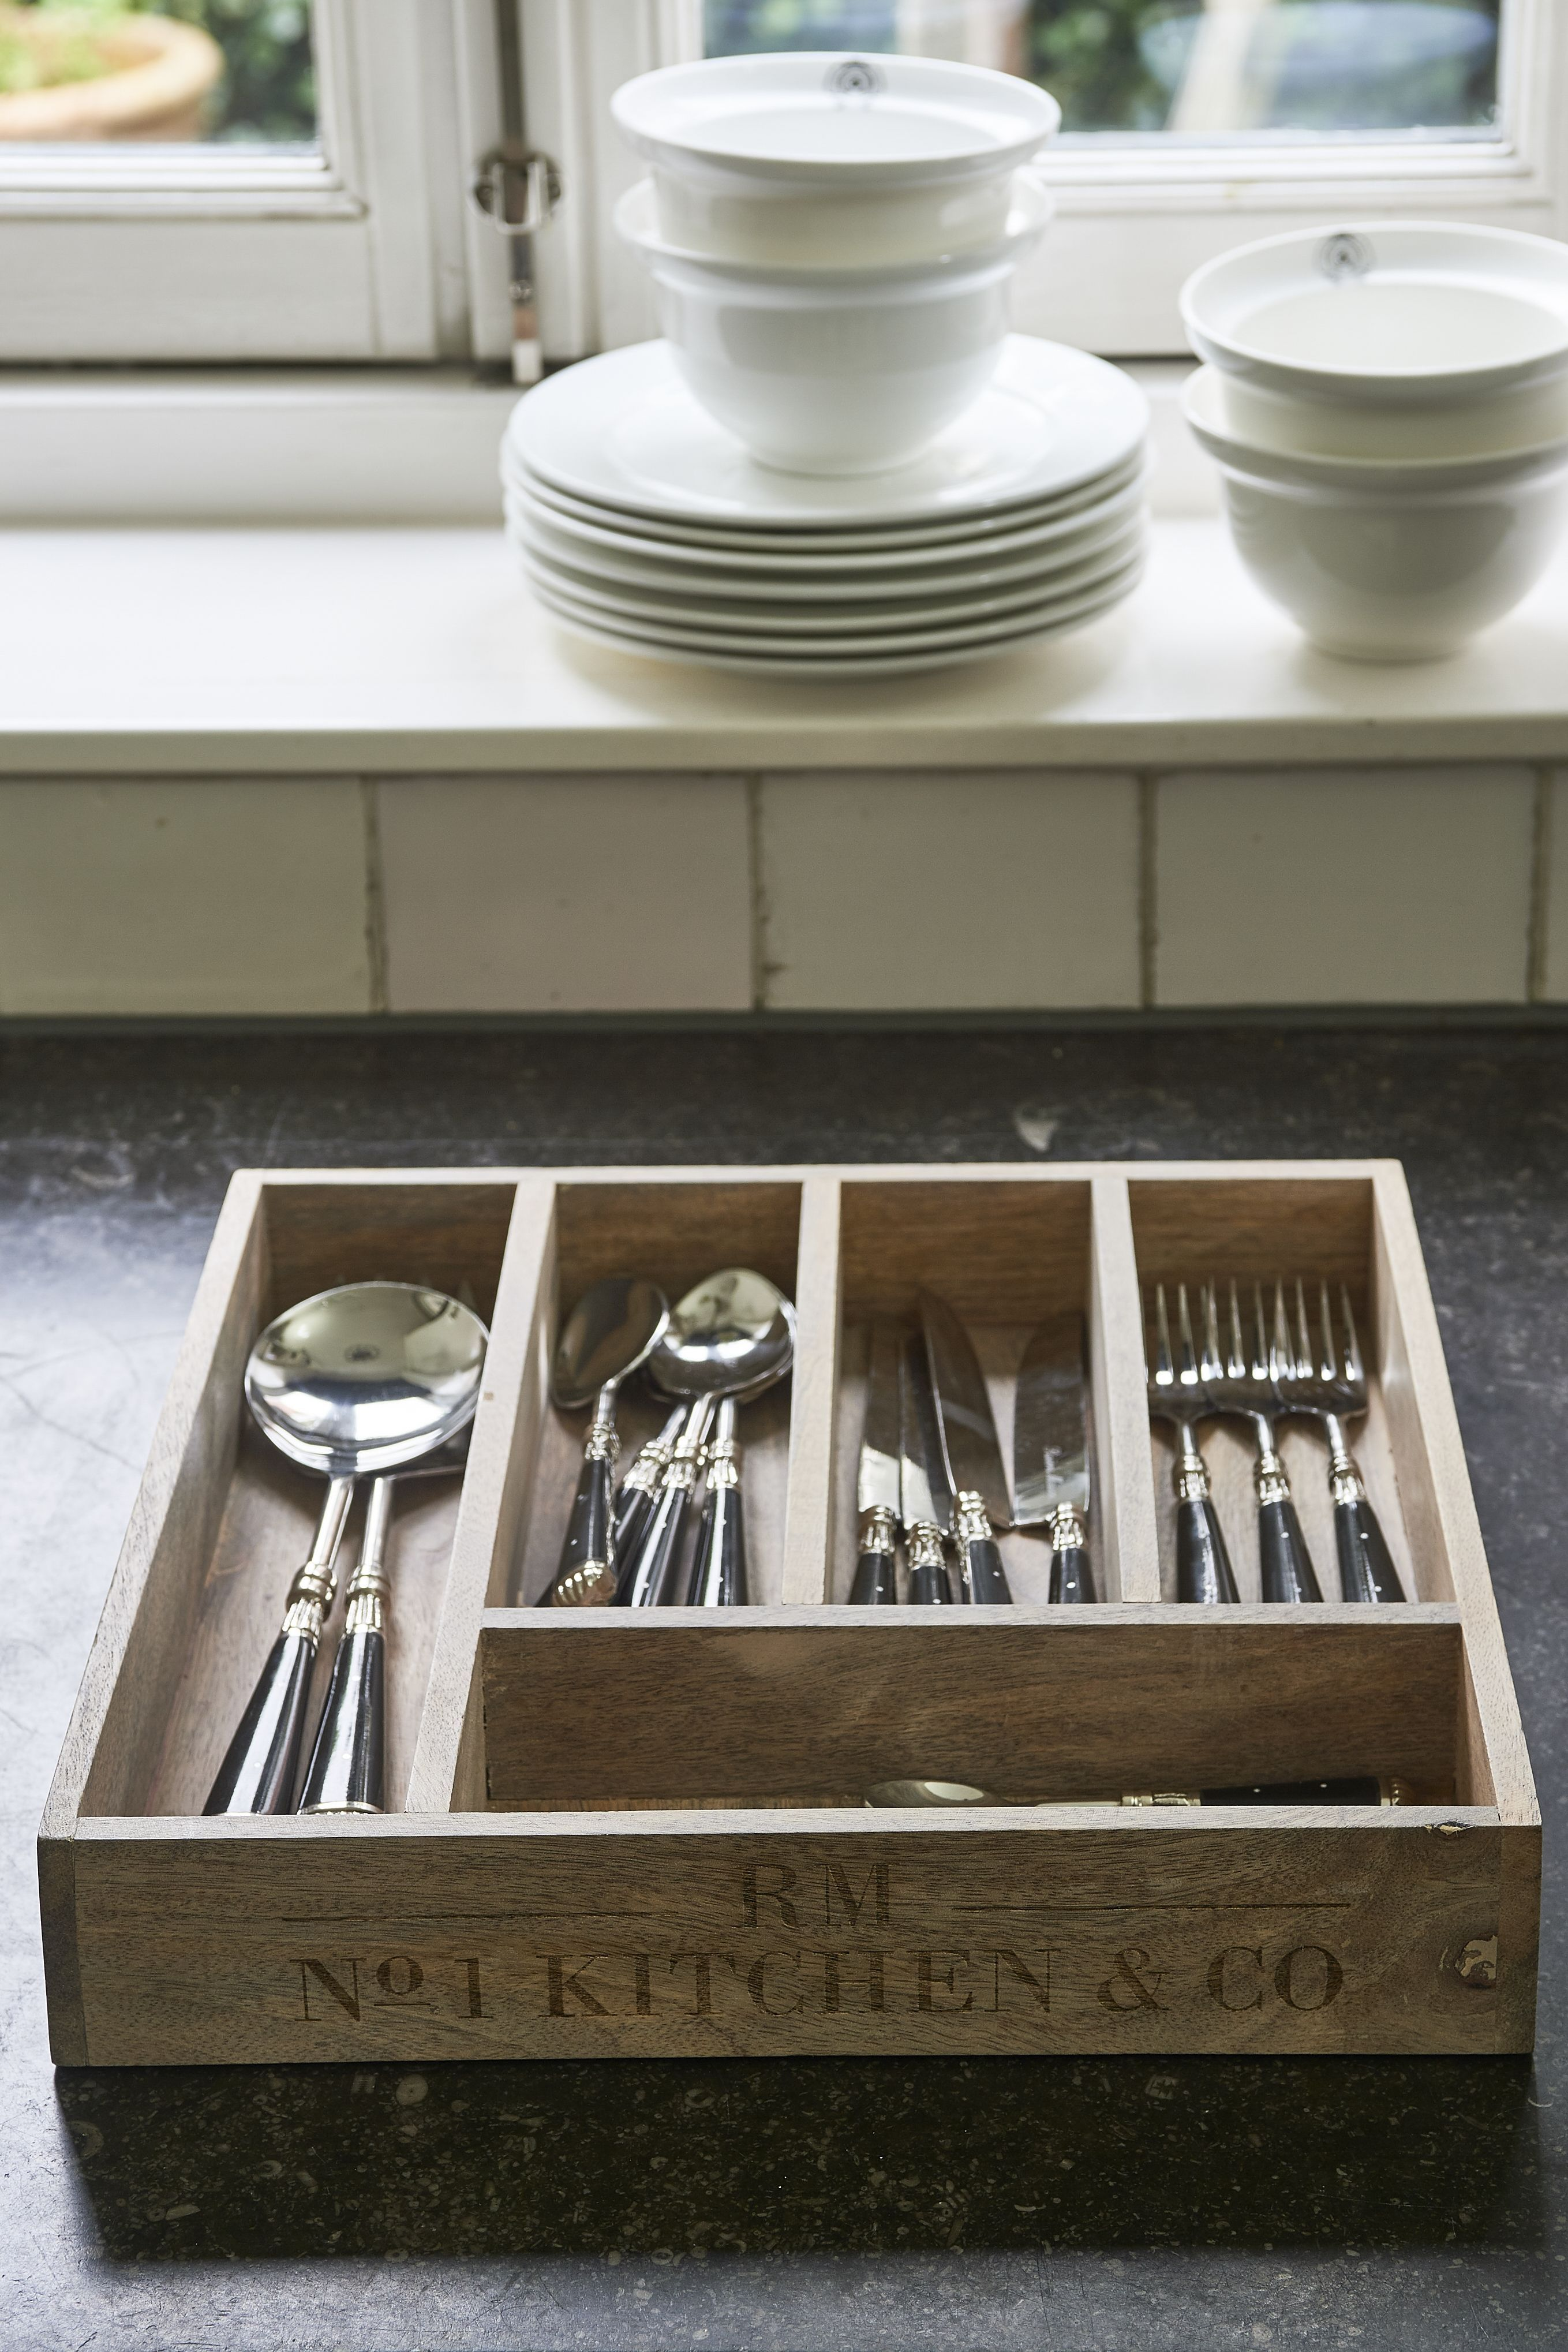 Organizér Kitchen & Co Cutlery